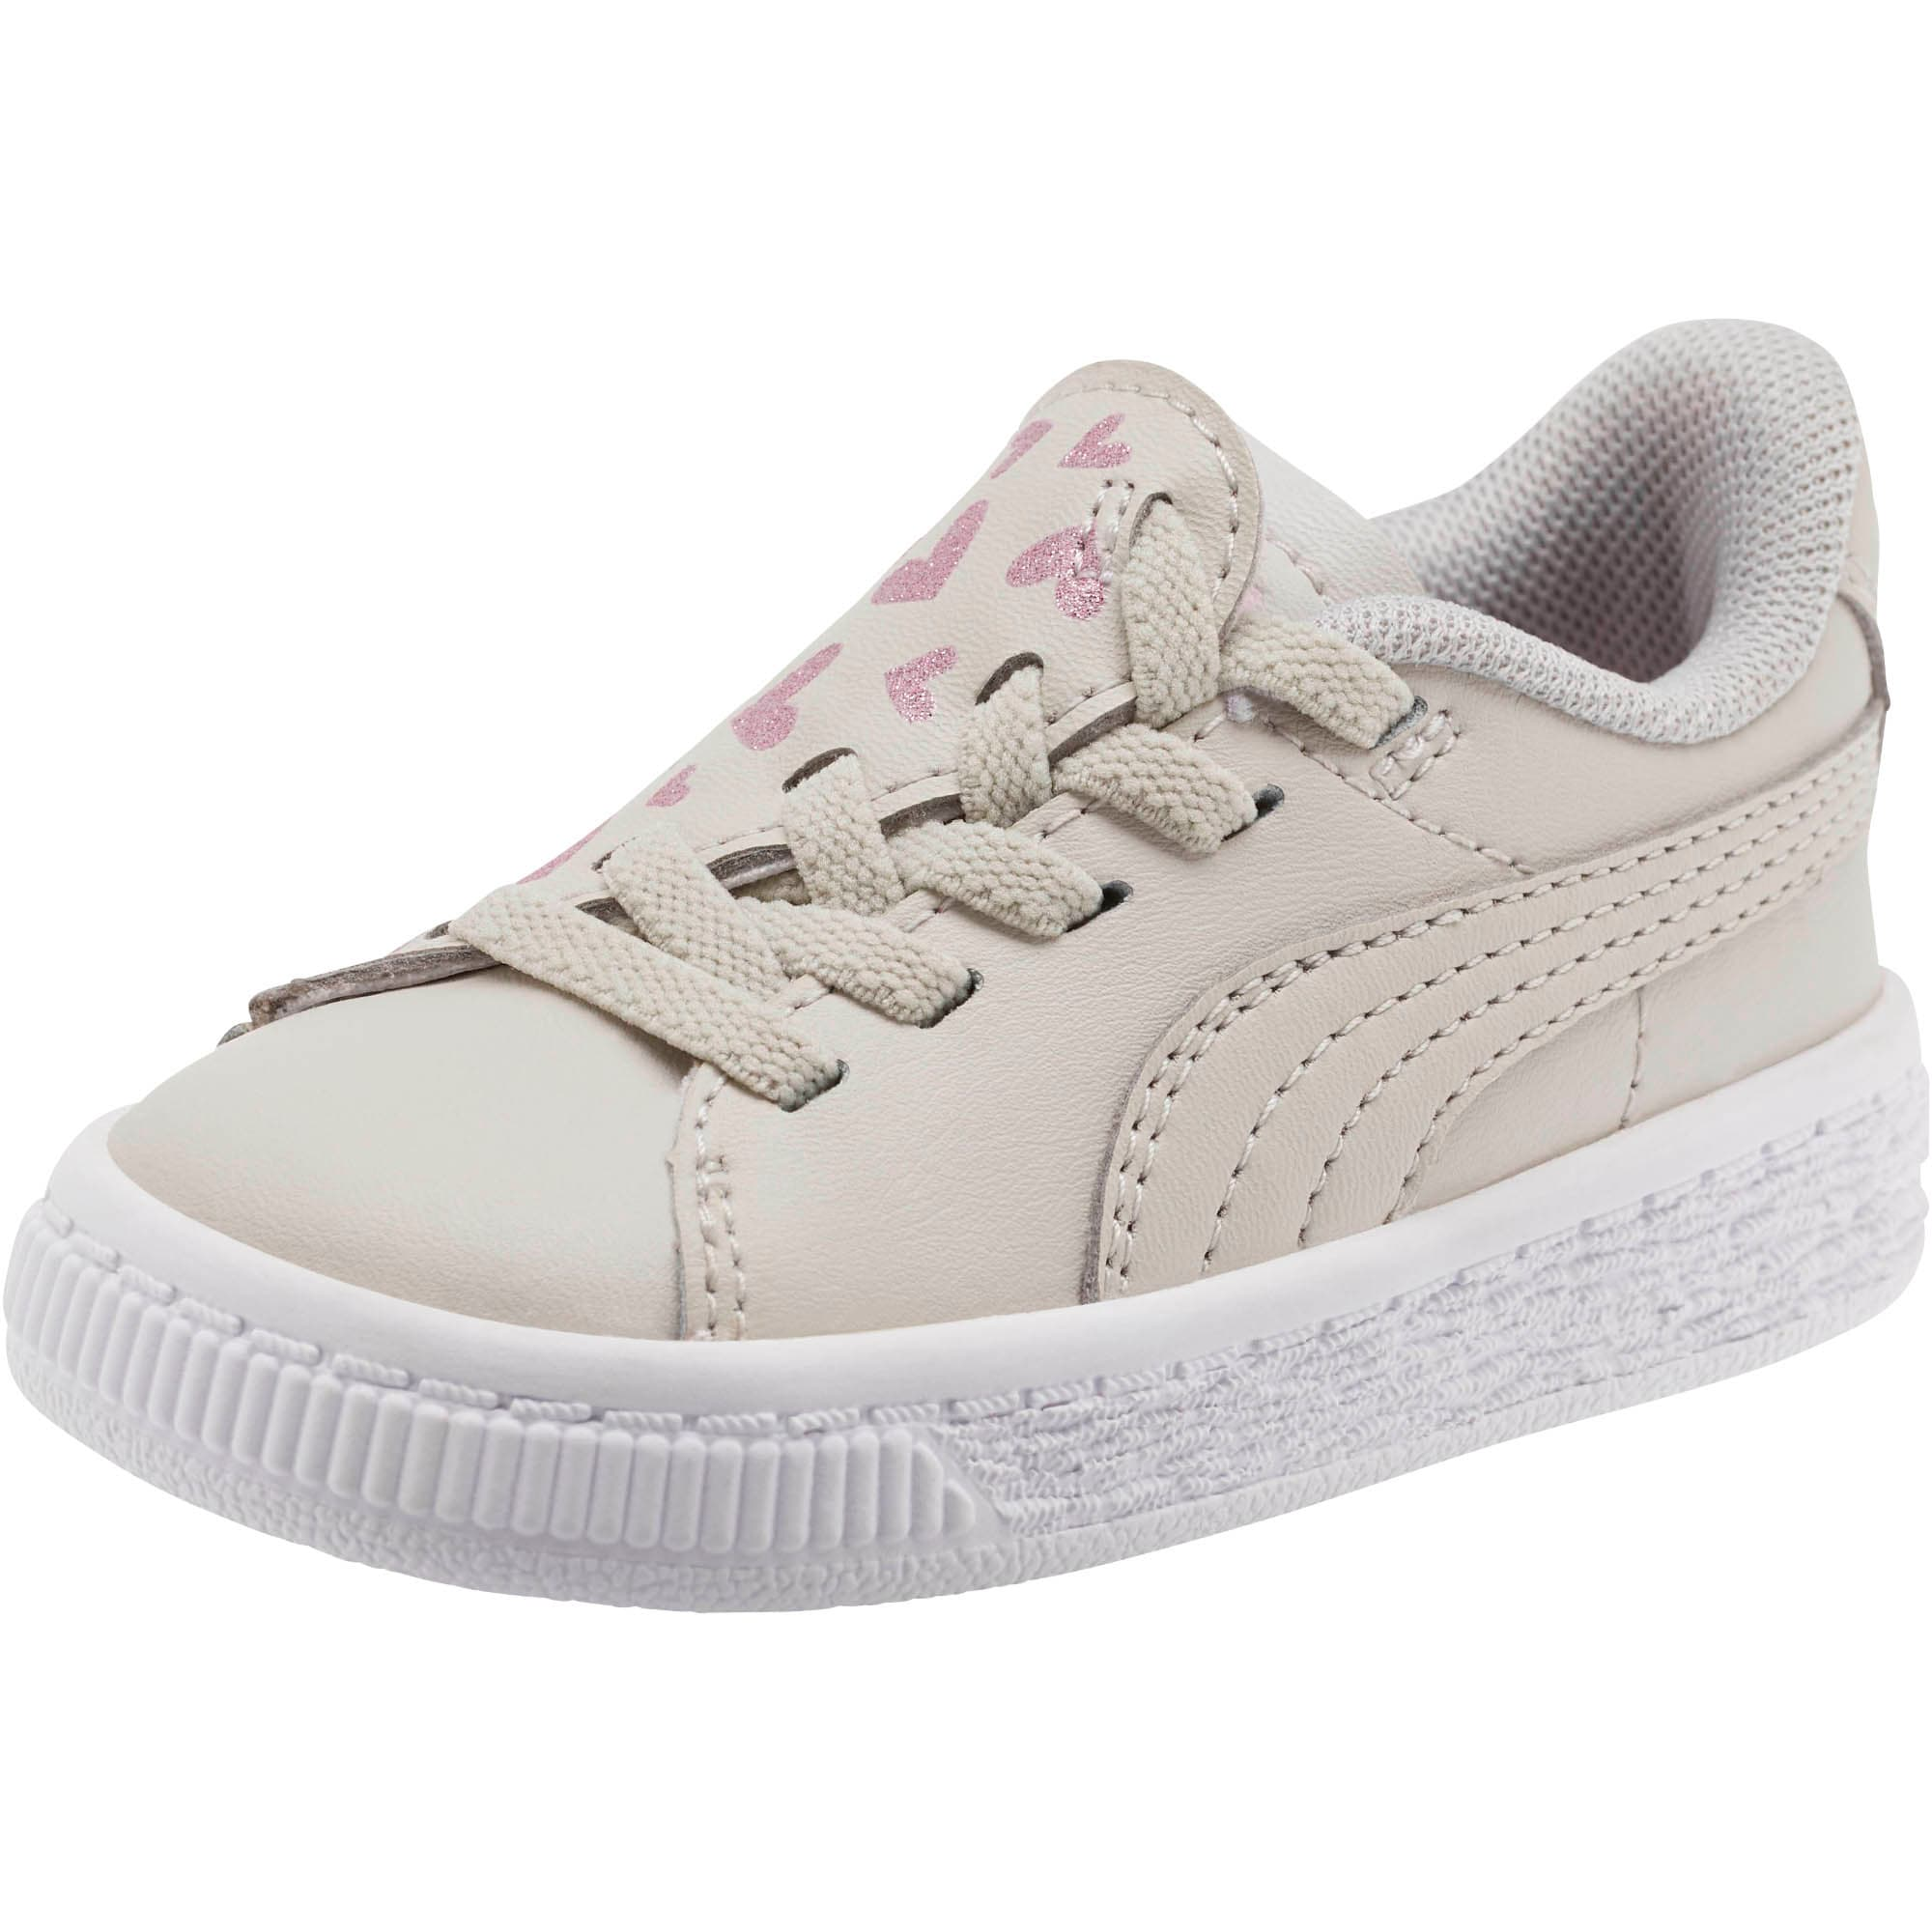 Thumbnail 1 of Basket Crush Glitter Hearts AC Toddler Shoes, Gray Violet-Puma White, medium